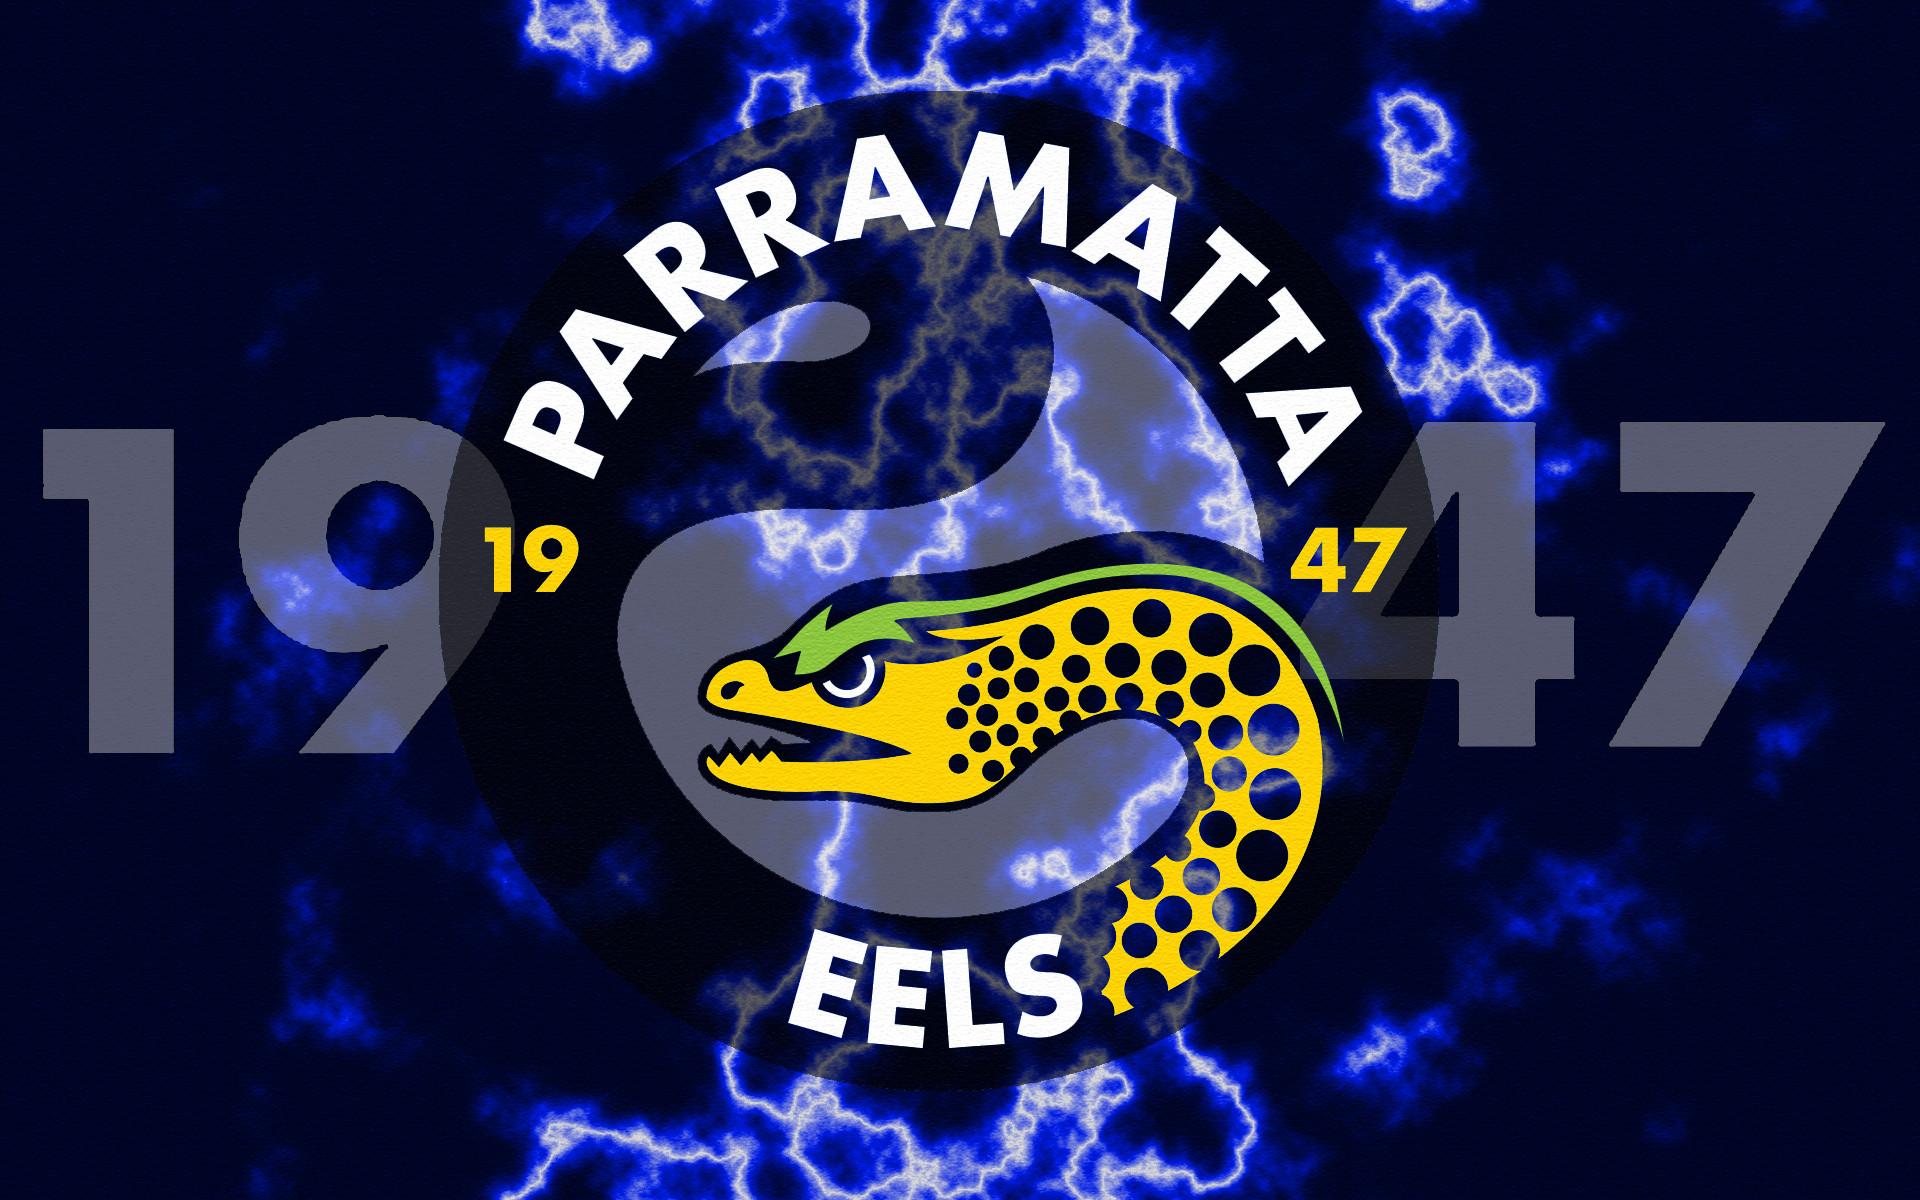 Parramatta Eels 1947 Lightning Wallpaper by Sunnyboiiii